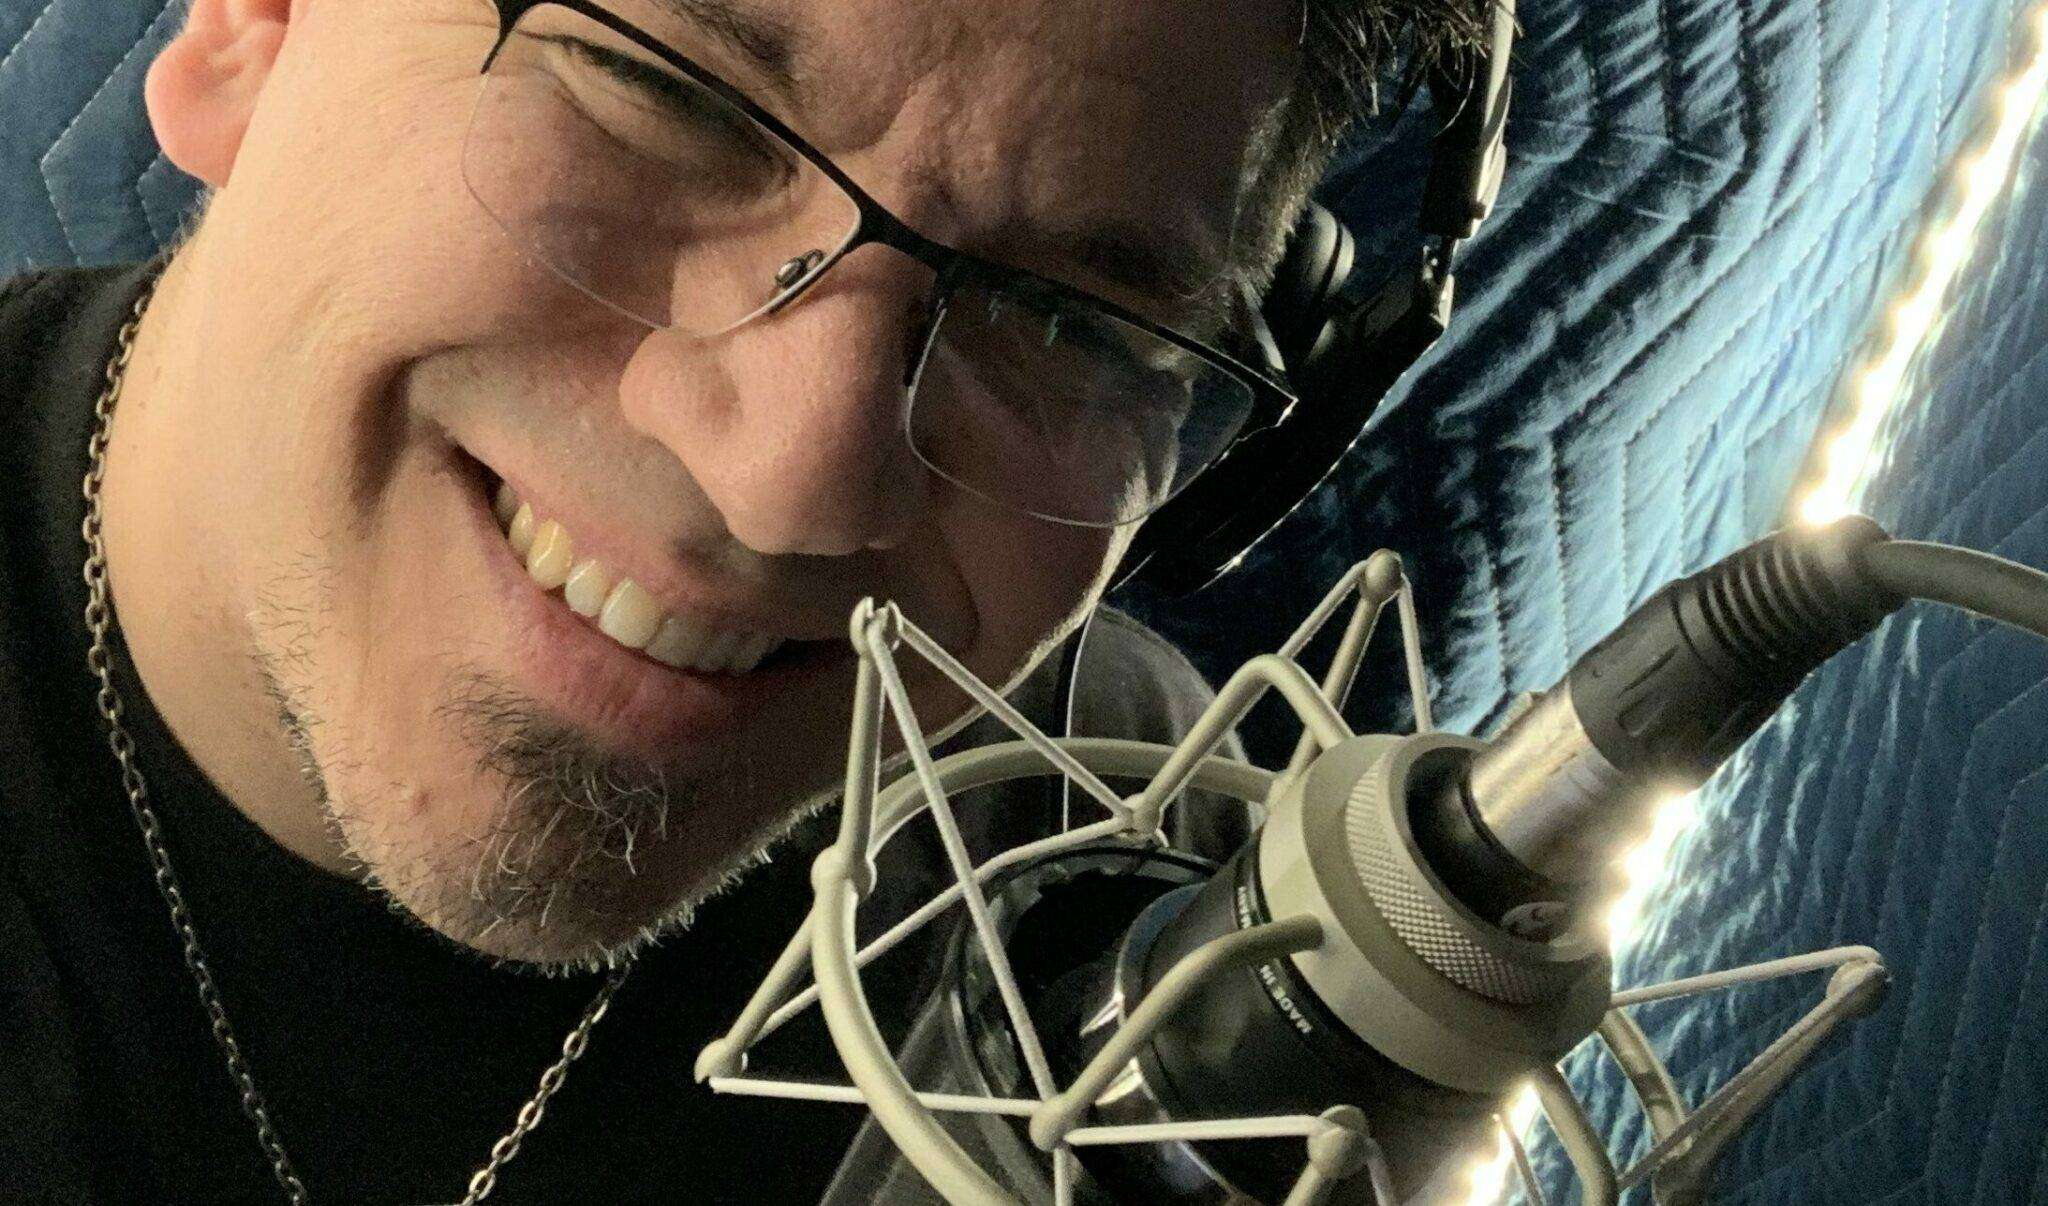 Professional Voice over Artist Joshua Alexander – Seattle Voice Actor/Voiceover Talent